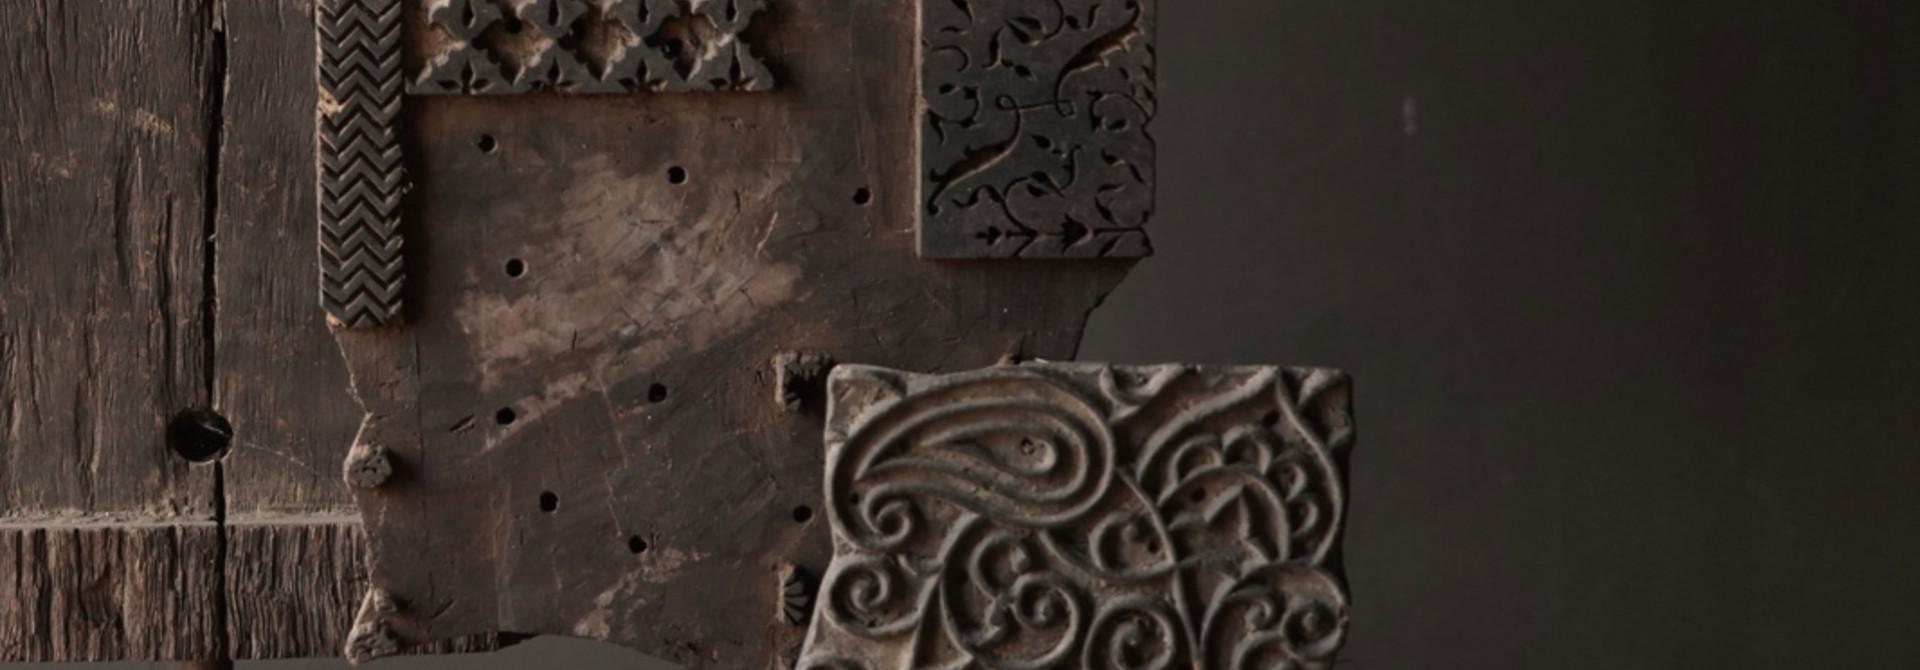 Batikstempel aus Holz auf Eisenbasis